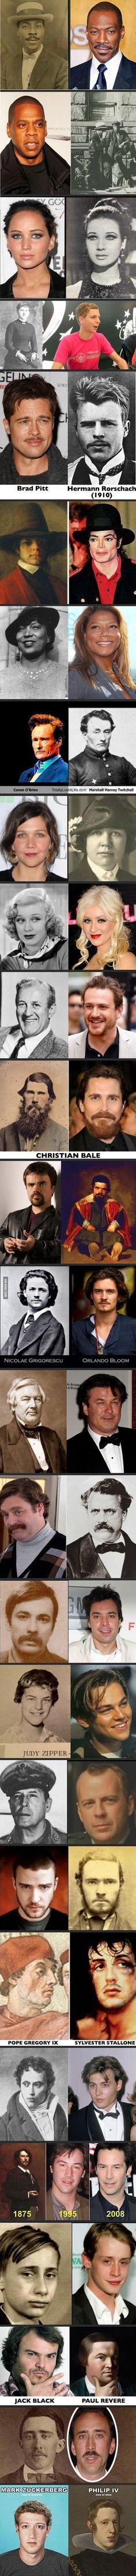 Celebrity Reincarnations?? much more celebrities Lookalikes! Amazing!! #lookalike via @9GAG #famous #look-alike